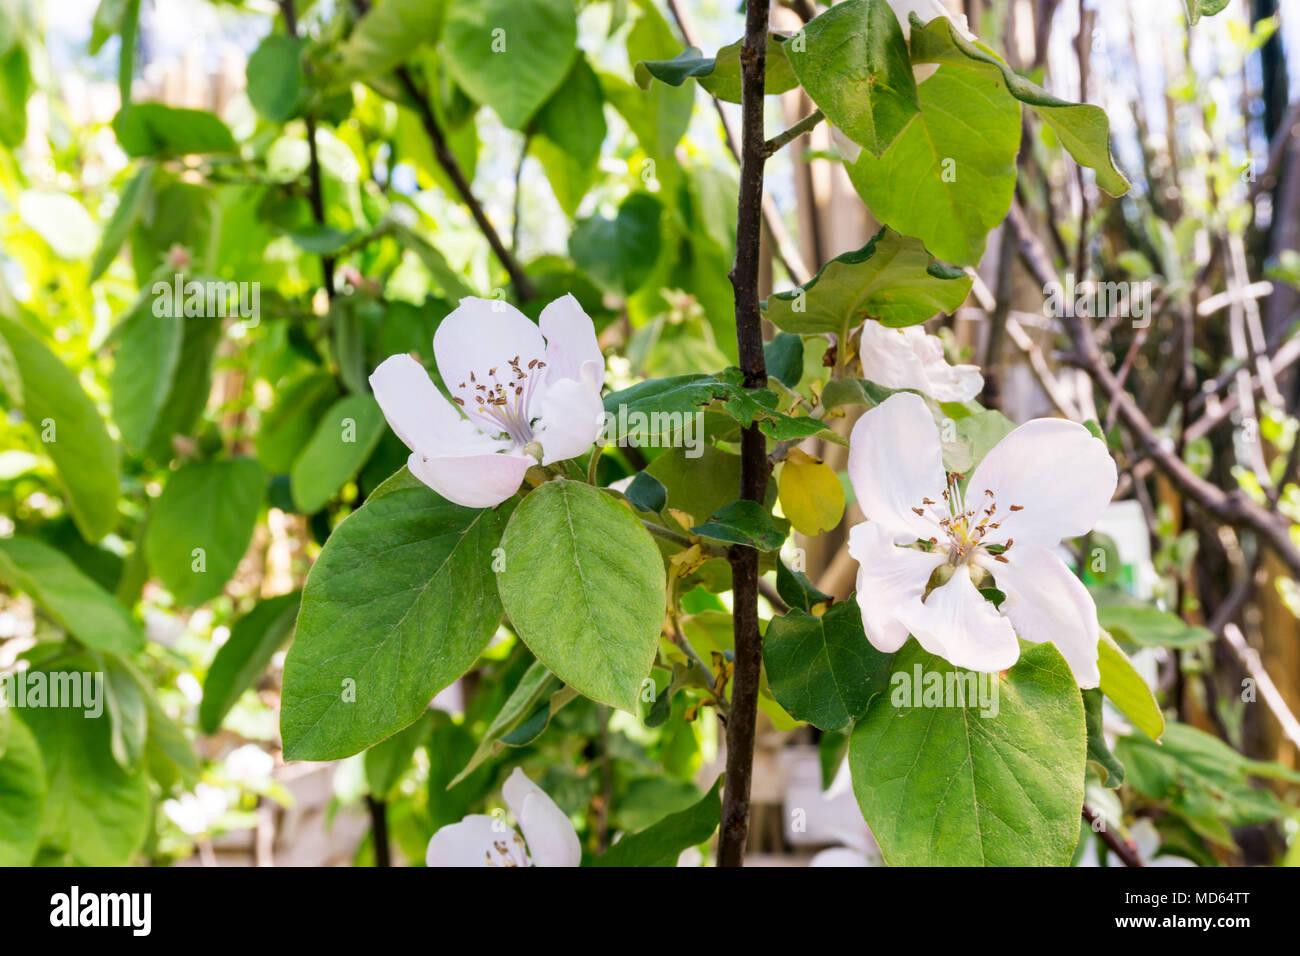 "Blumen der Quitte Baum, Cydonia Oblonga ""Champion"". Stockbild"